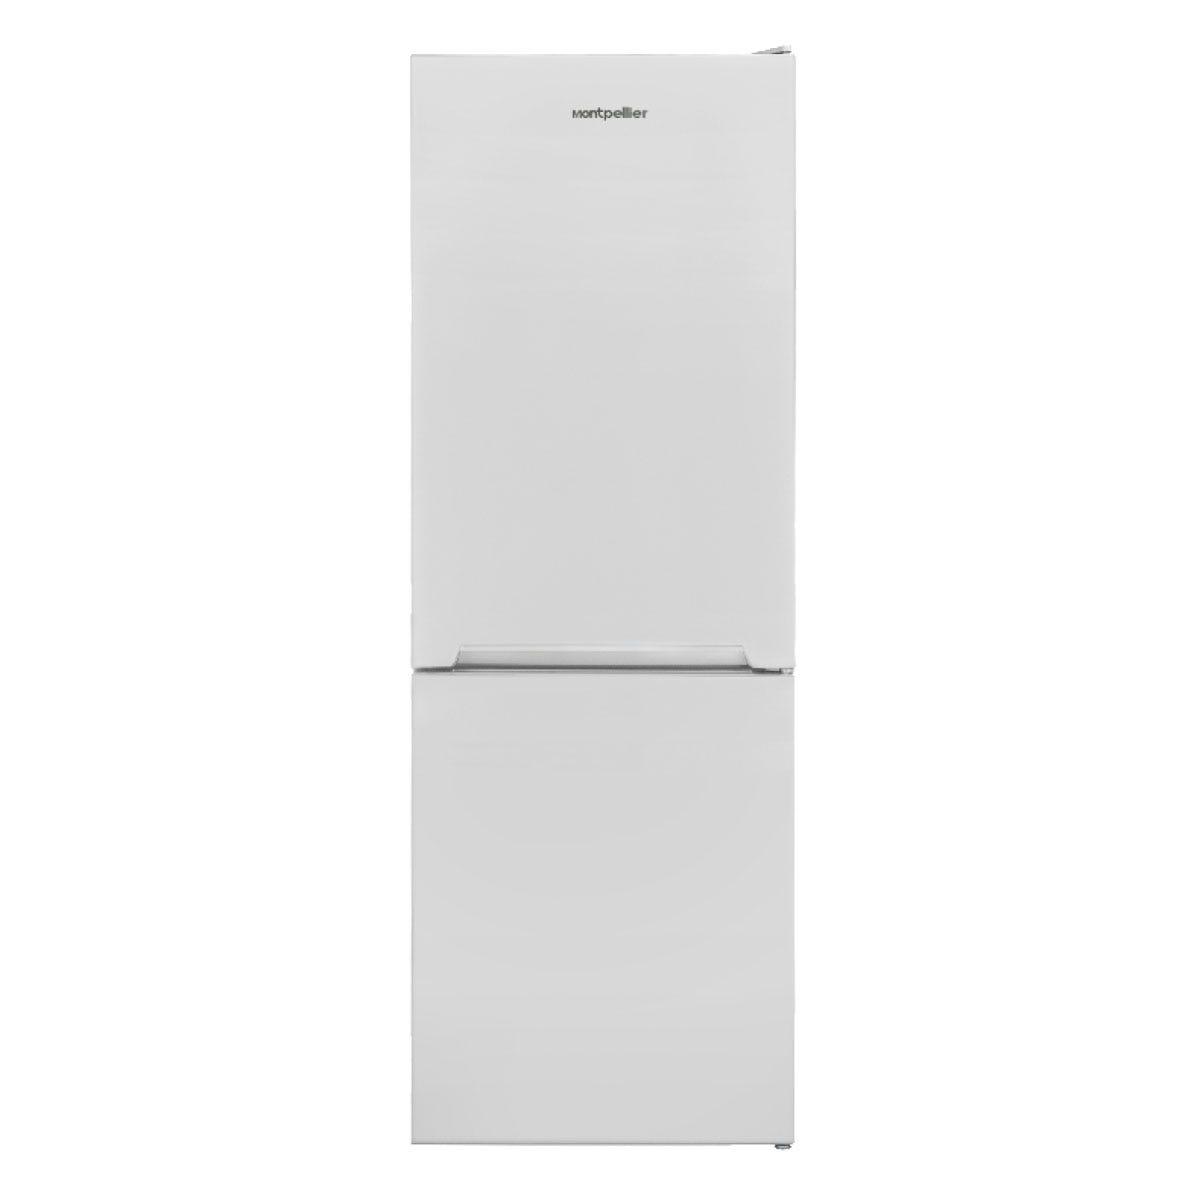 Montpellier MFF155W 54cm 50/50 Frost Free Fridge Freezer - White